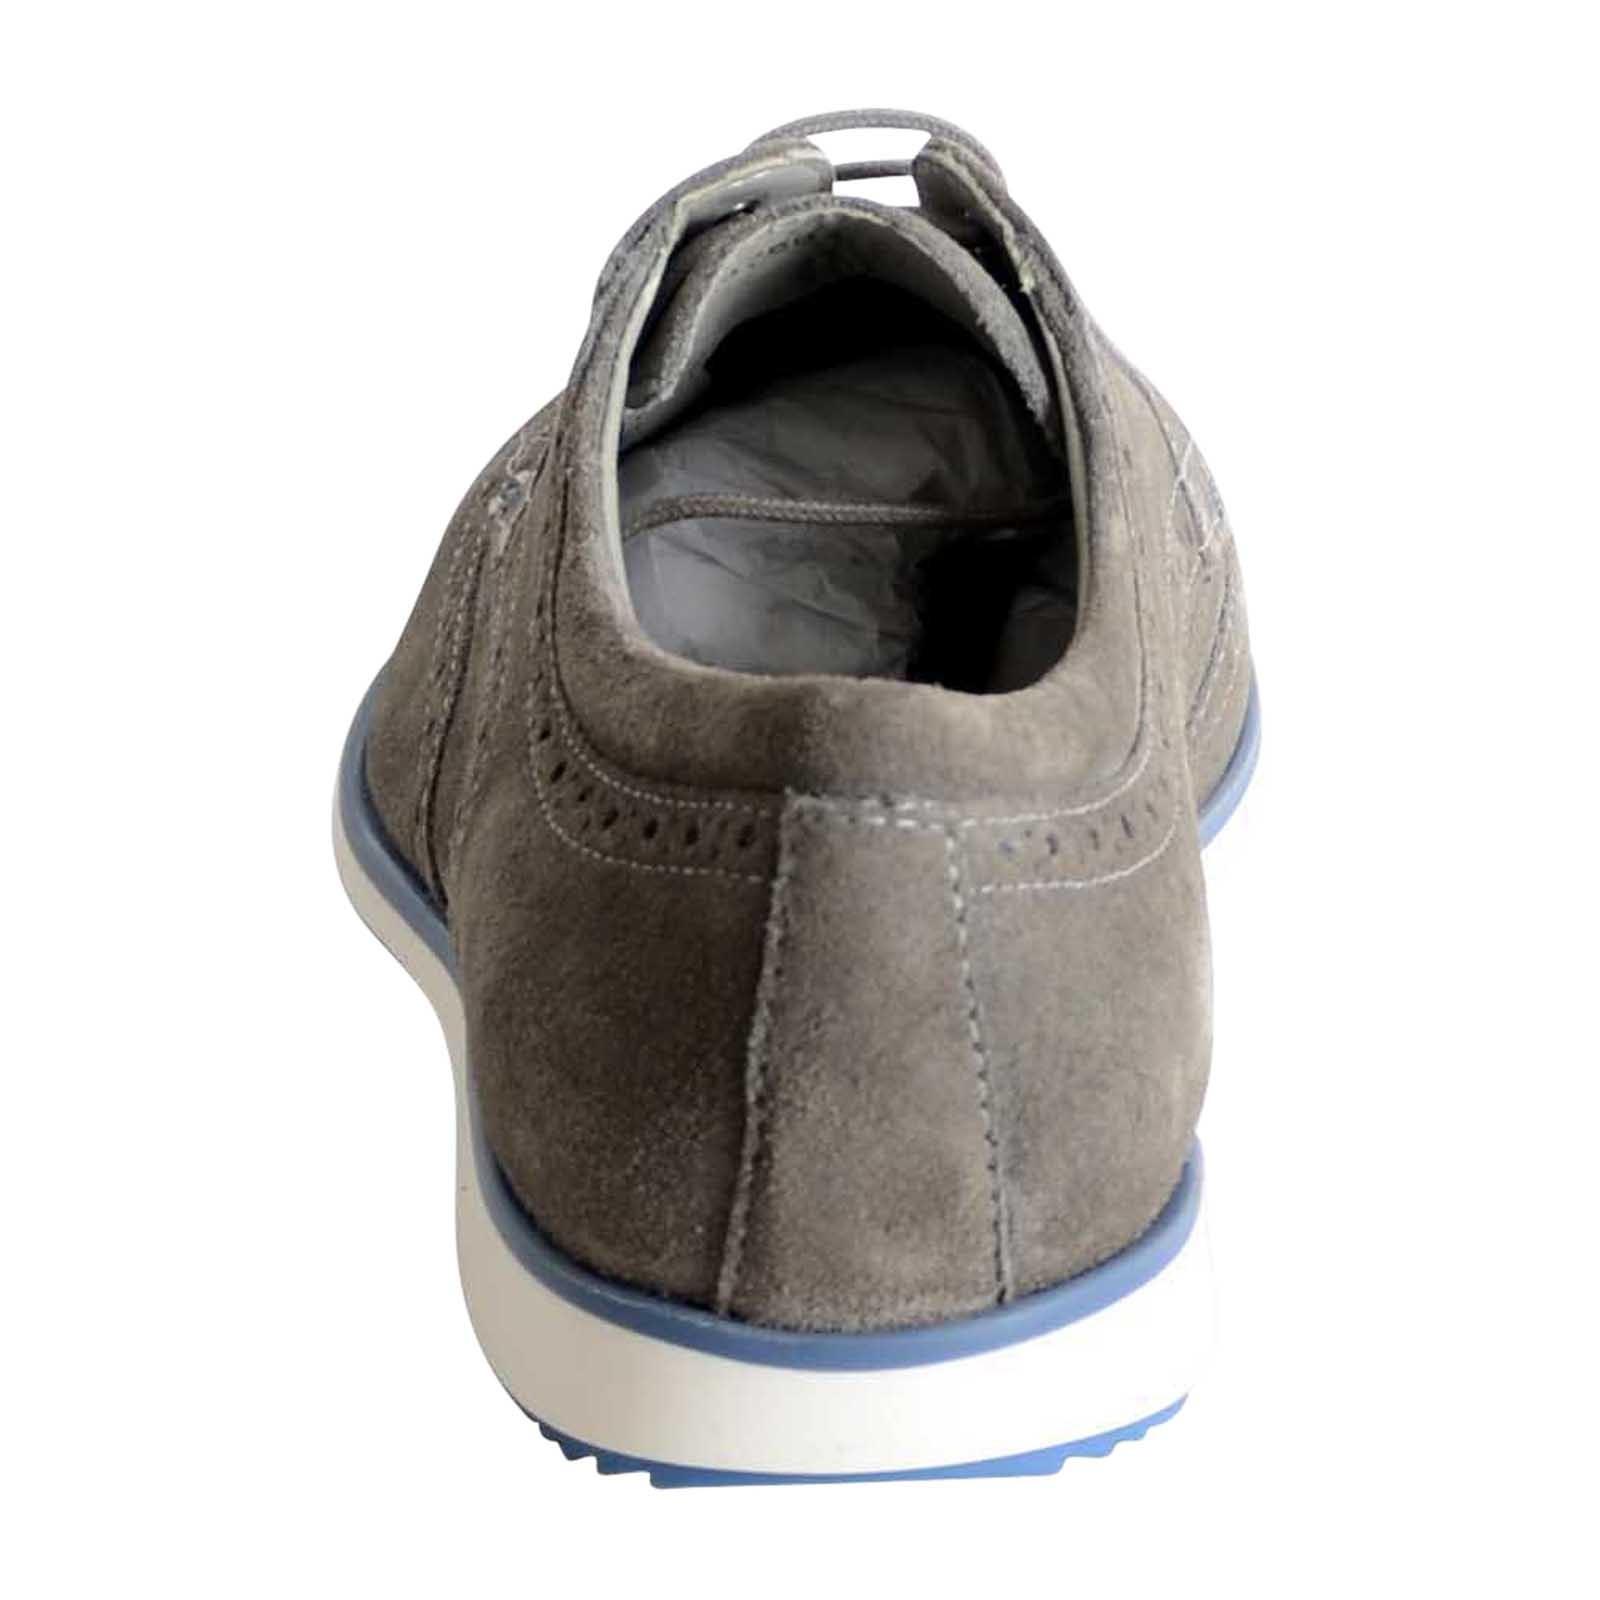 Chaussure-Geox-U-BLAINEY-A-SUEDE miniature 9